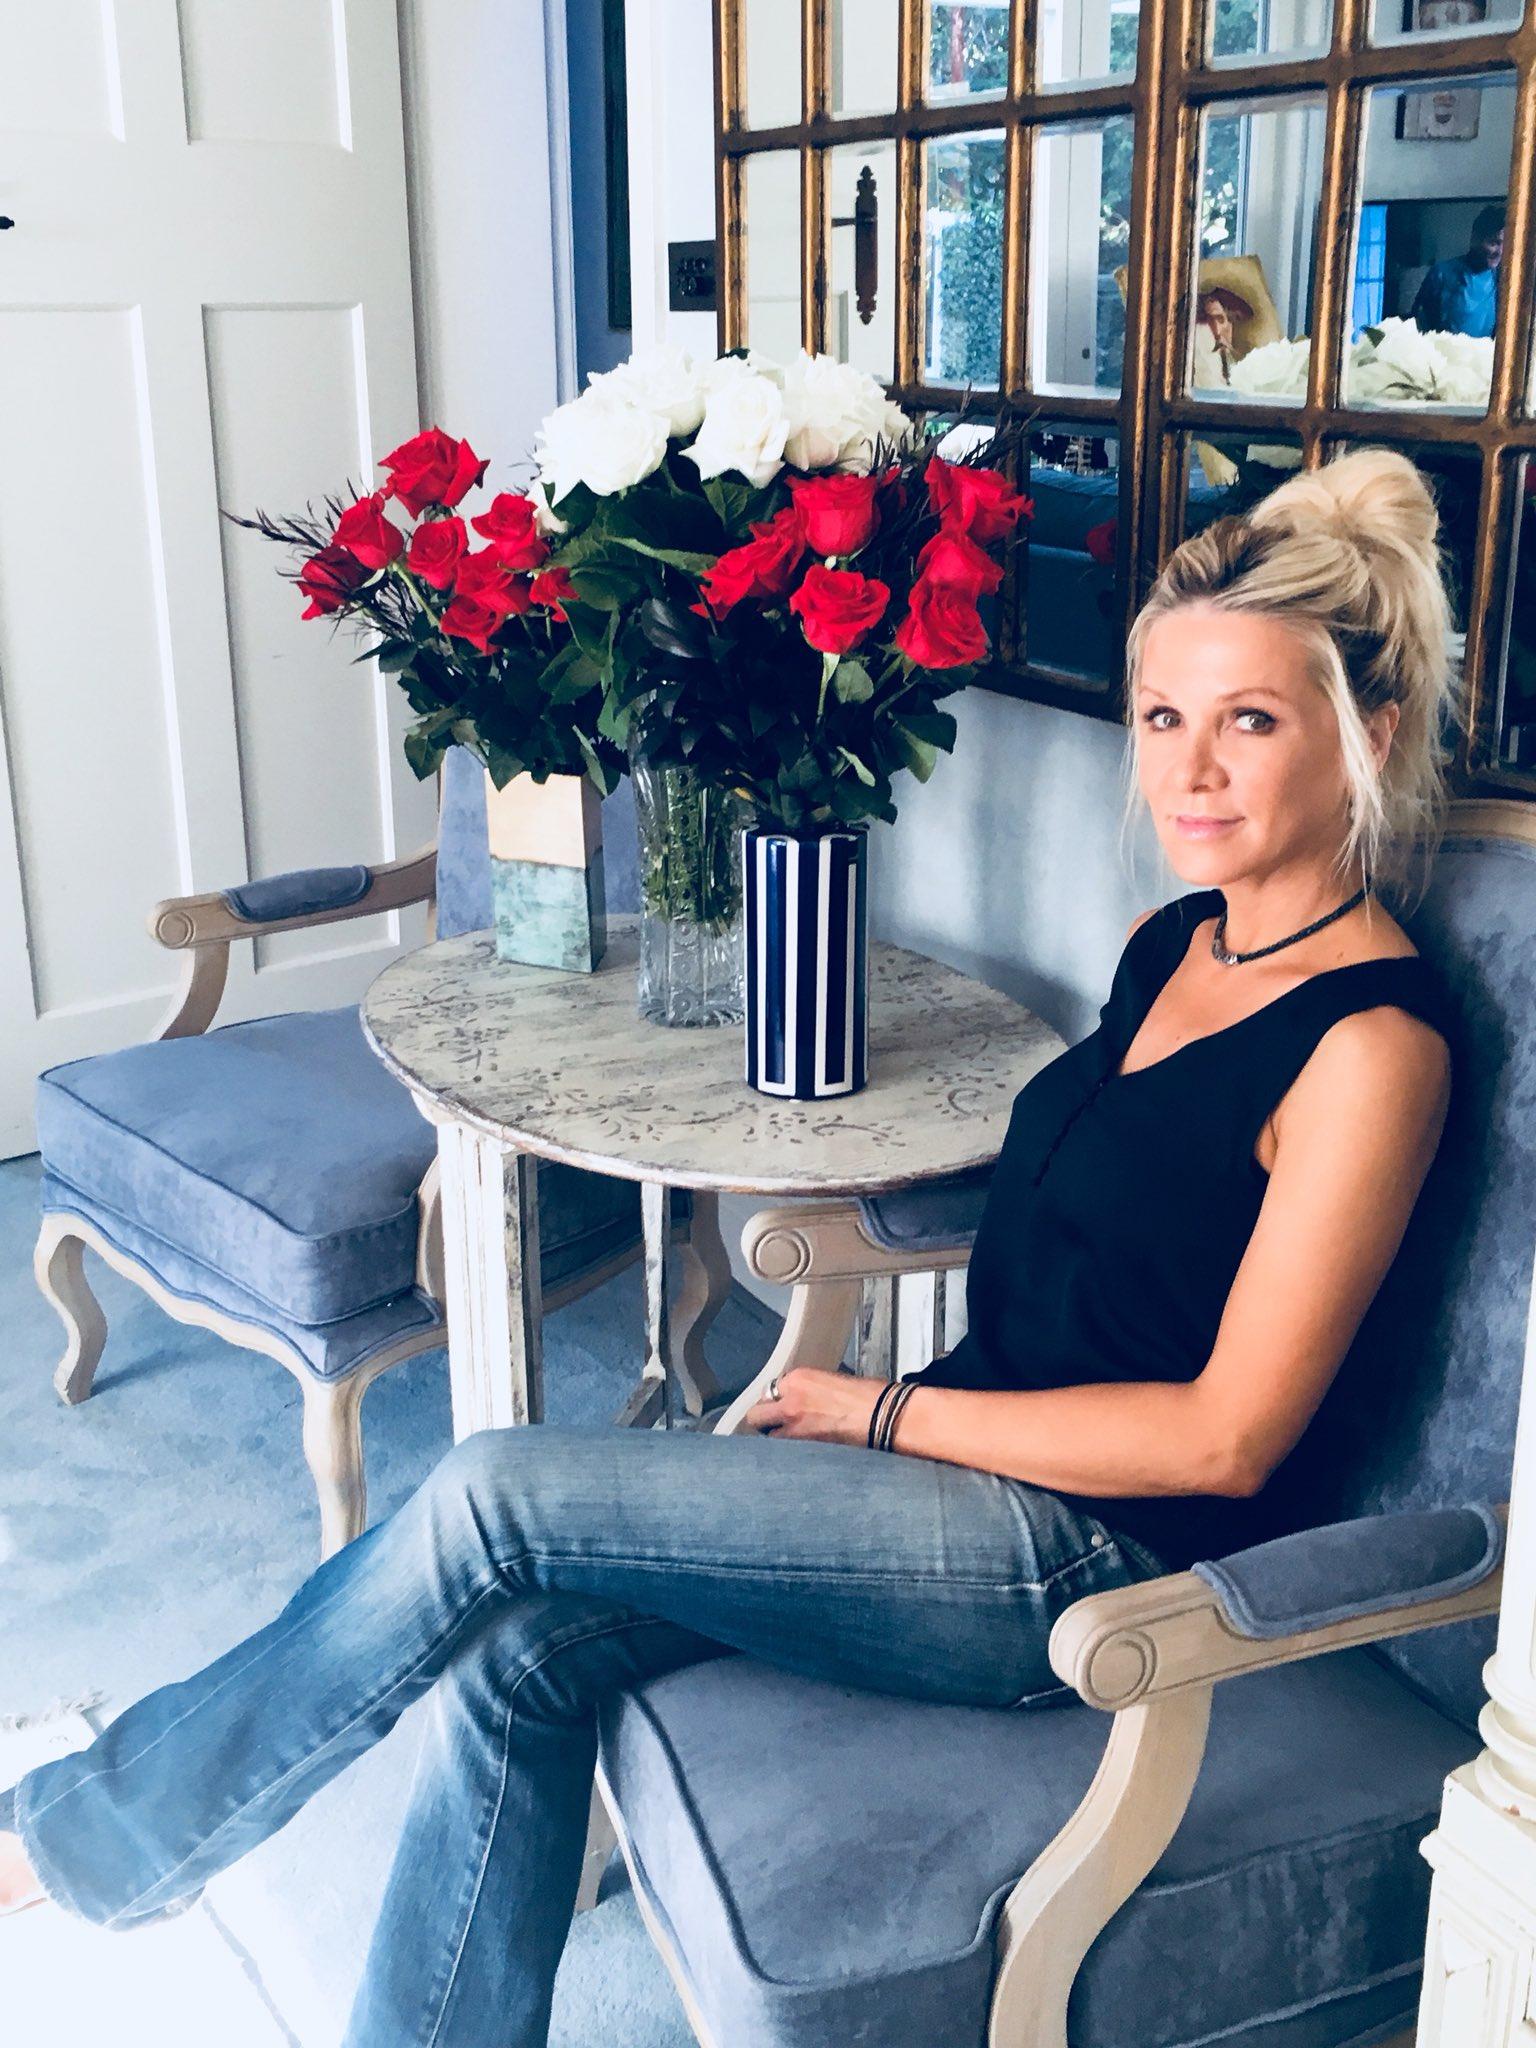 RT @spencerdanielle: Happy Valentine's Day! Hope you all got spoilt. Dx  #valentinesday #roses #RedRoses #love https://t.co/4RjO8baavm